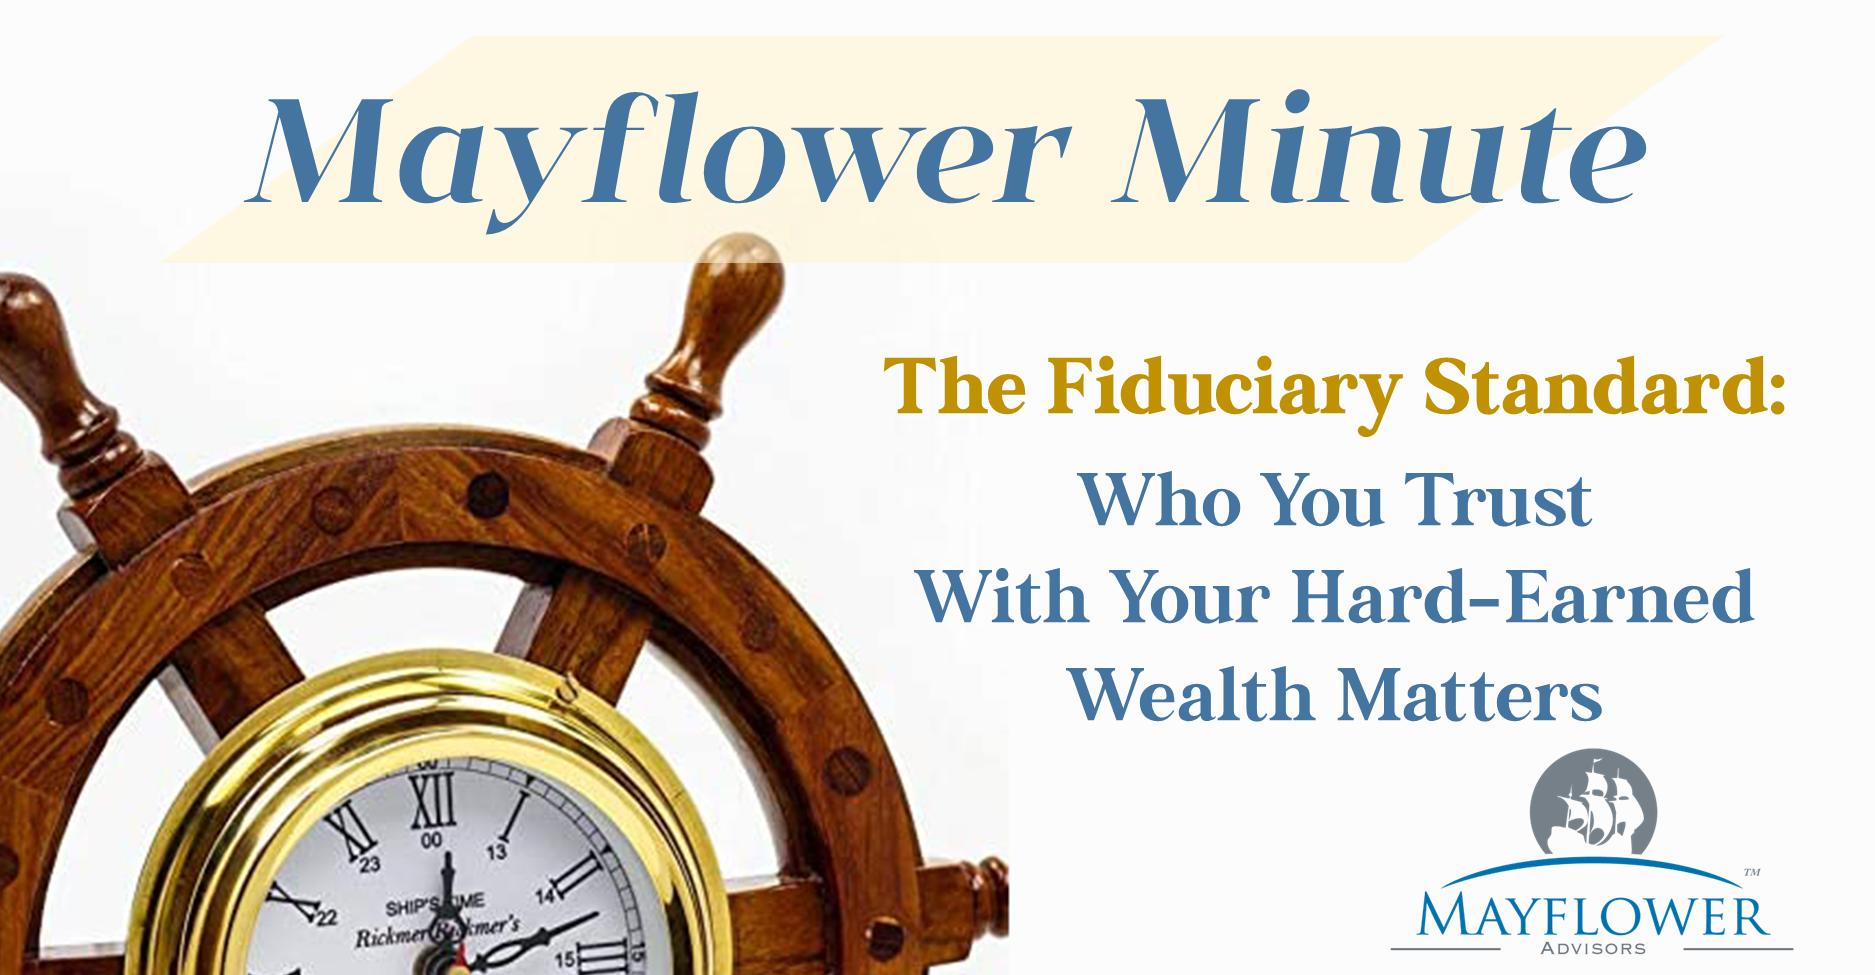 Mayflower Minute_Fiduciary Banner